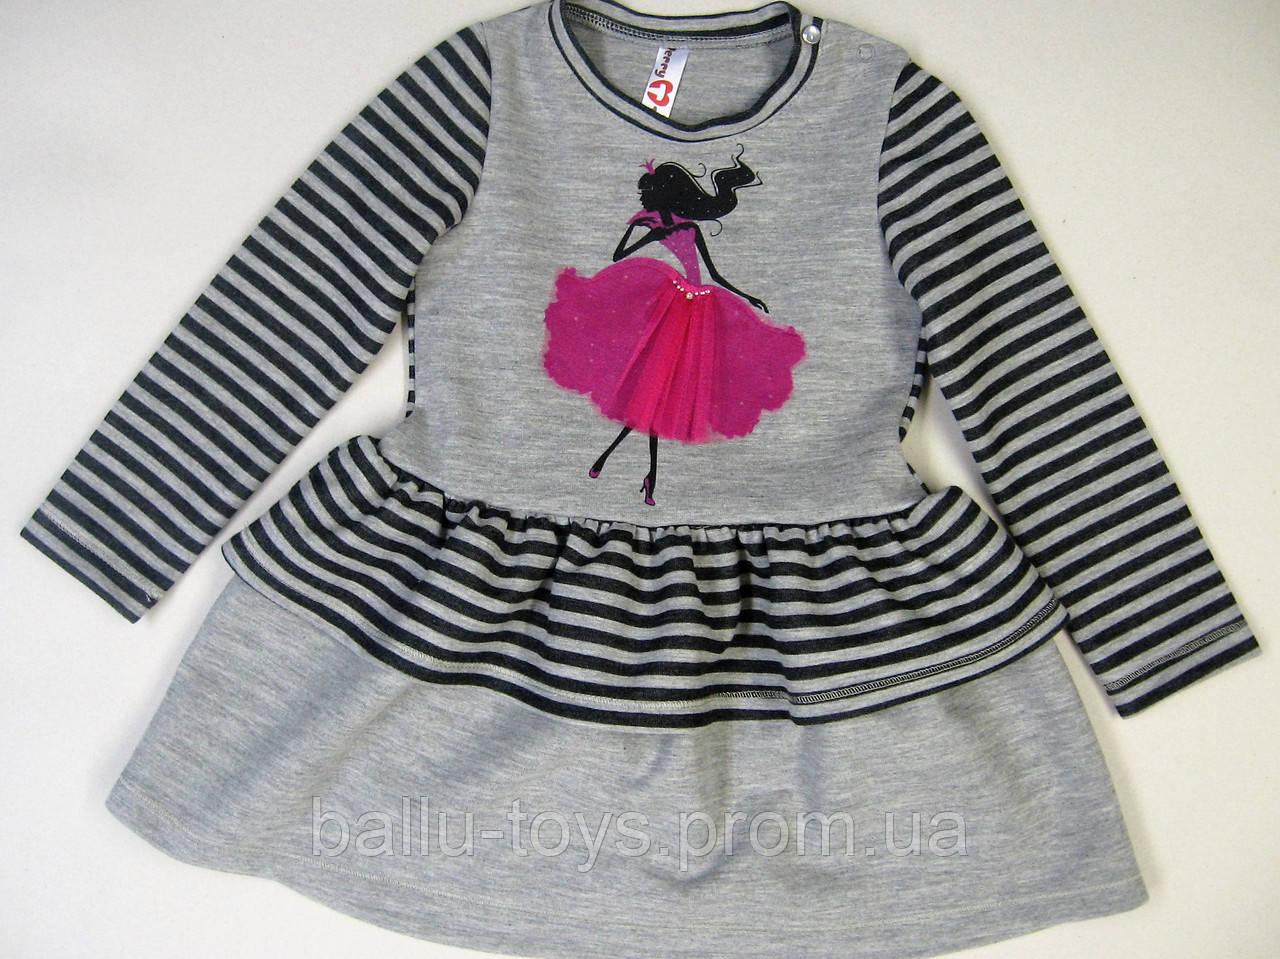 2e7770a1e42 Повседневное трикотажное платье на девочку (3-7 лет)  продажа